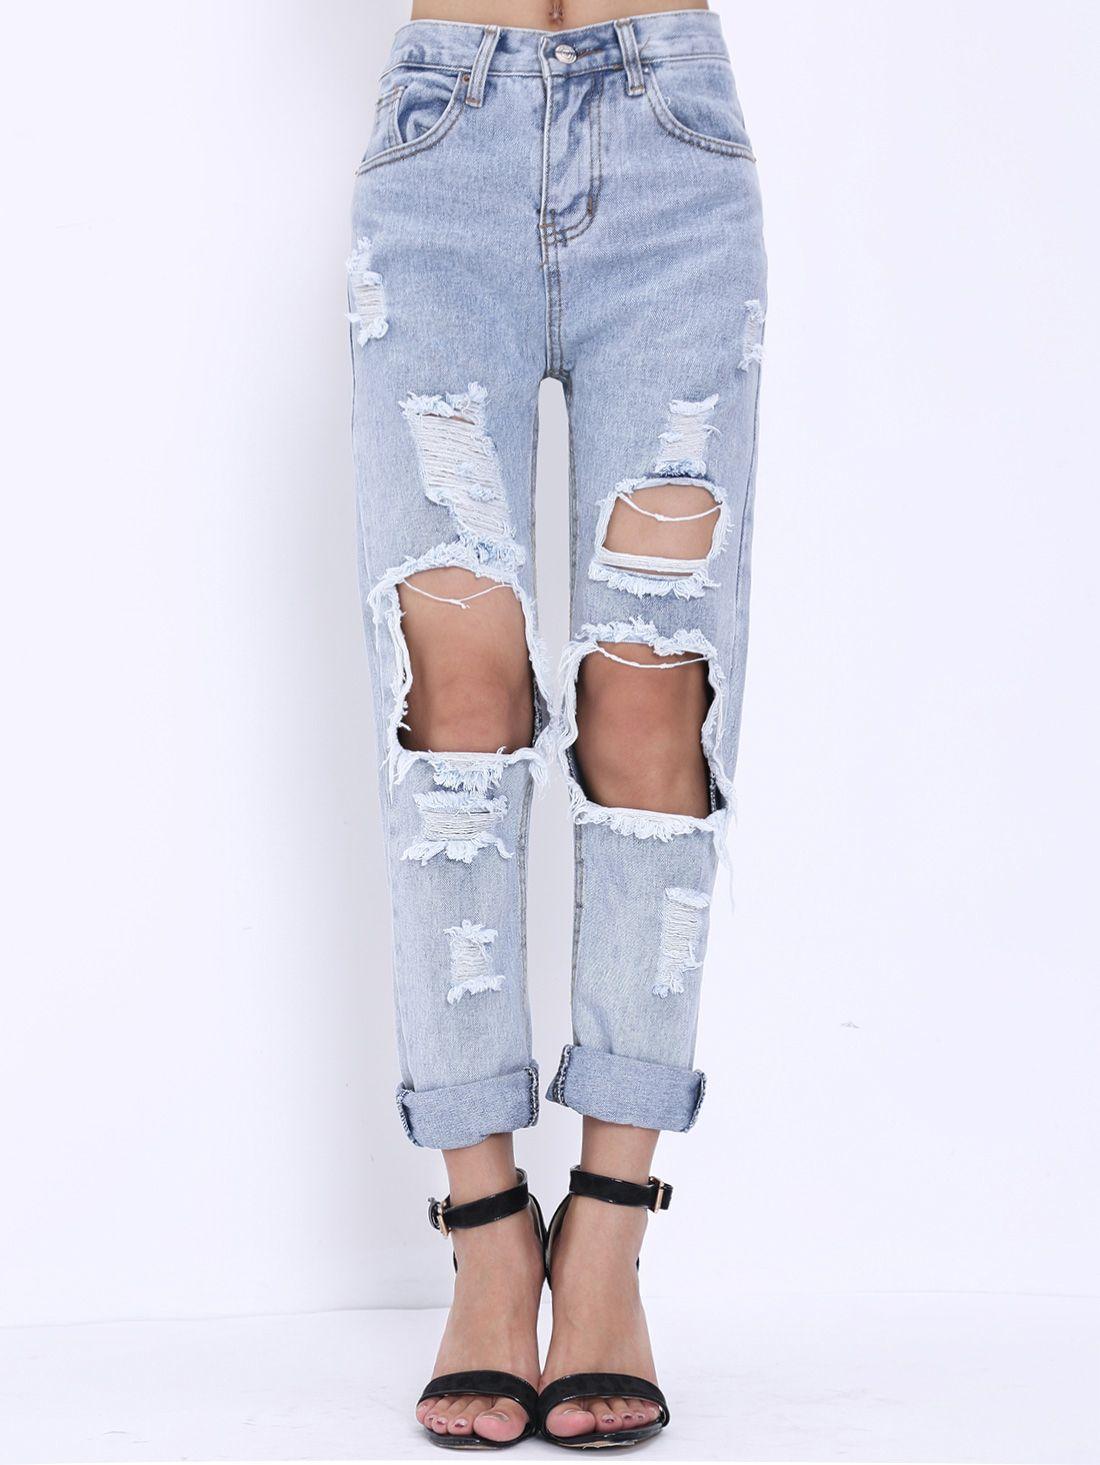 تحليل انها جميلة بعيدا جدا Jeans Rotos Sueltos 14thbrooklyn Org